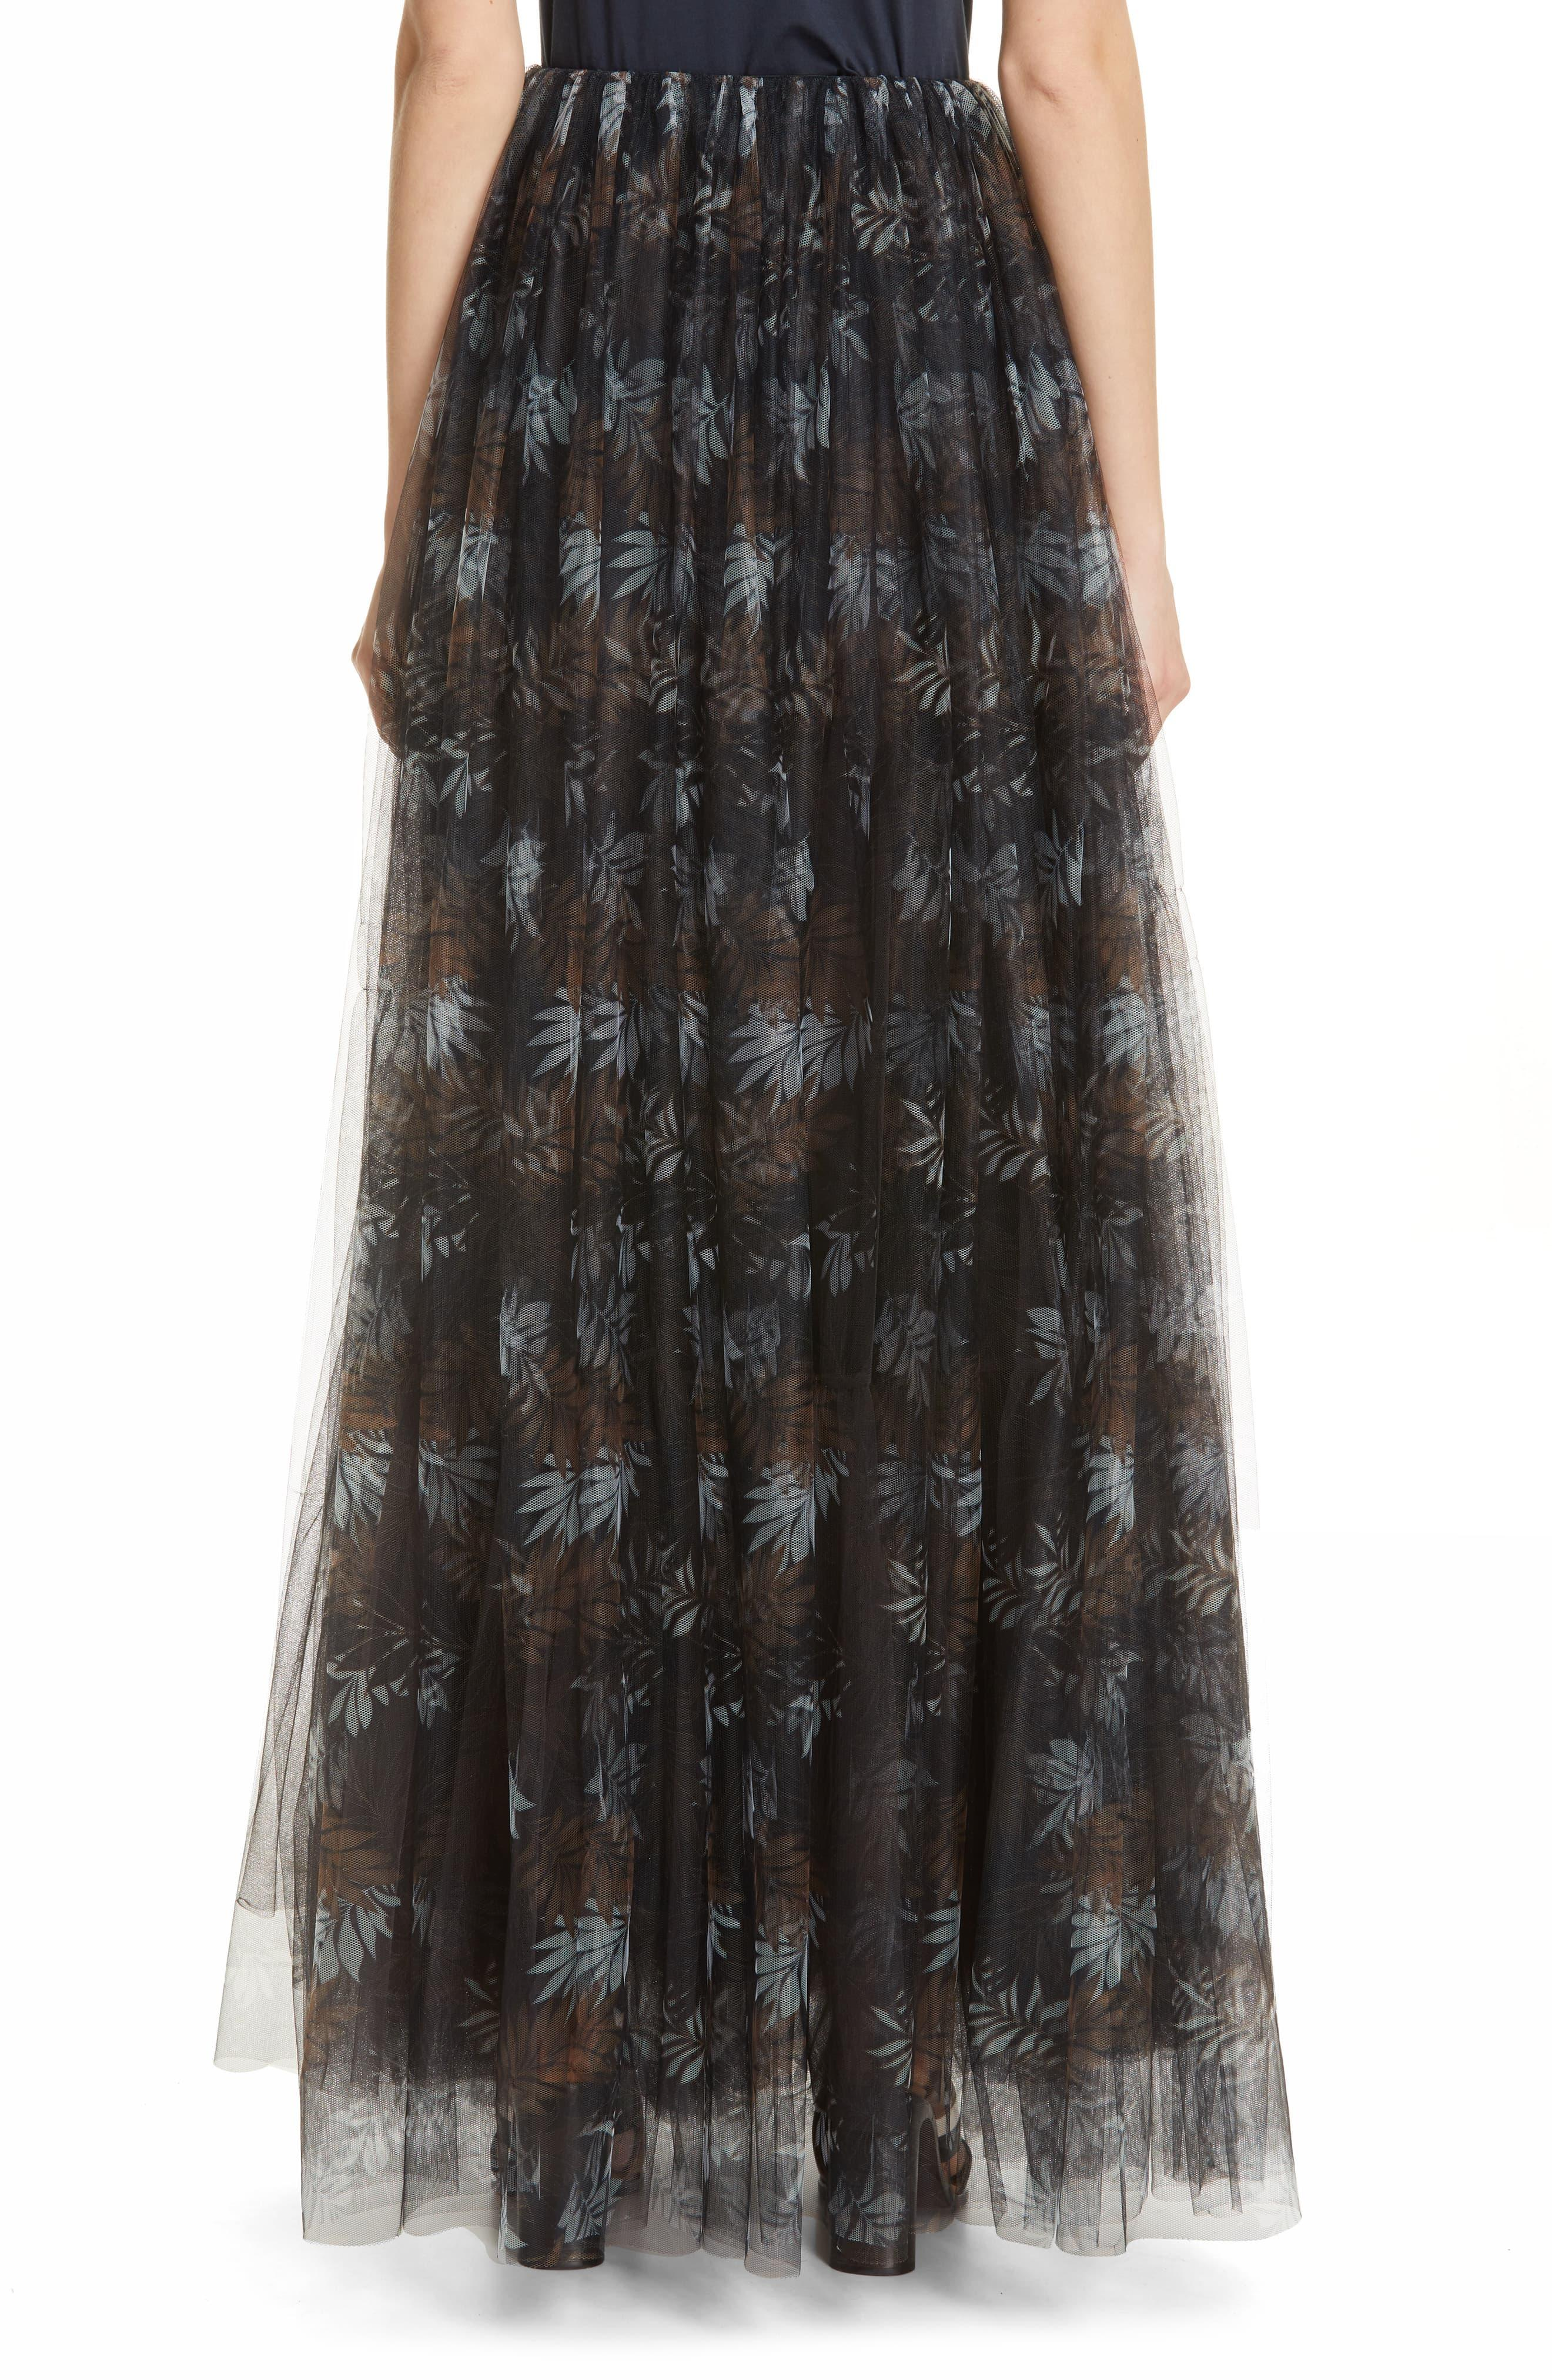 6ad4c30f3 Brunello Cucinelli - Black Floral Print Tulle Maxi Skirt - Lyst. View  fullscreen